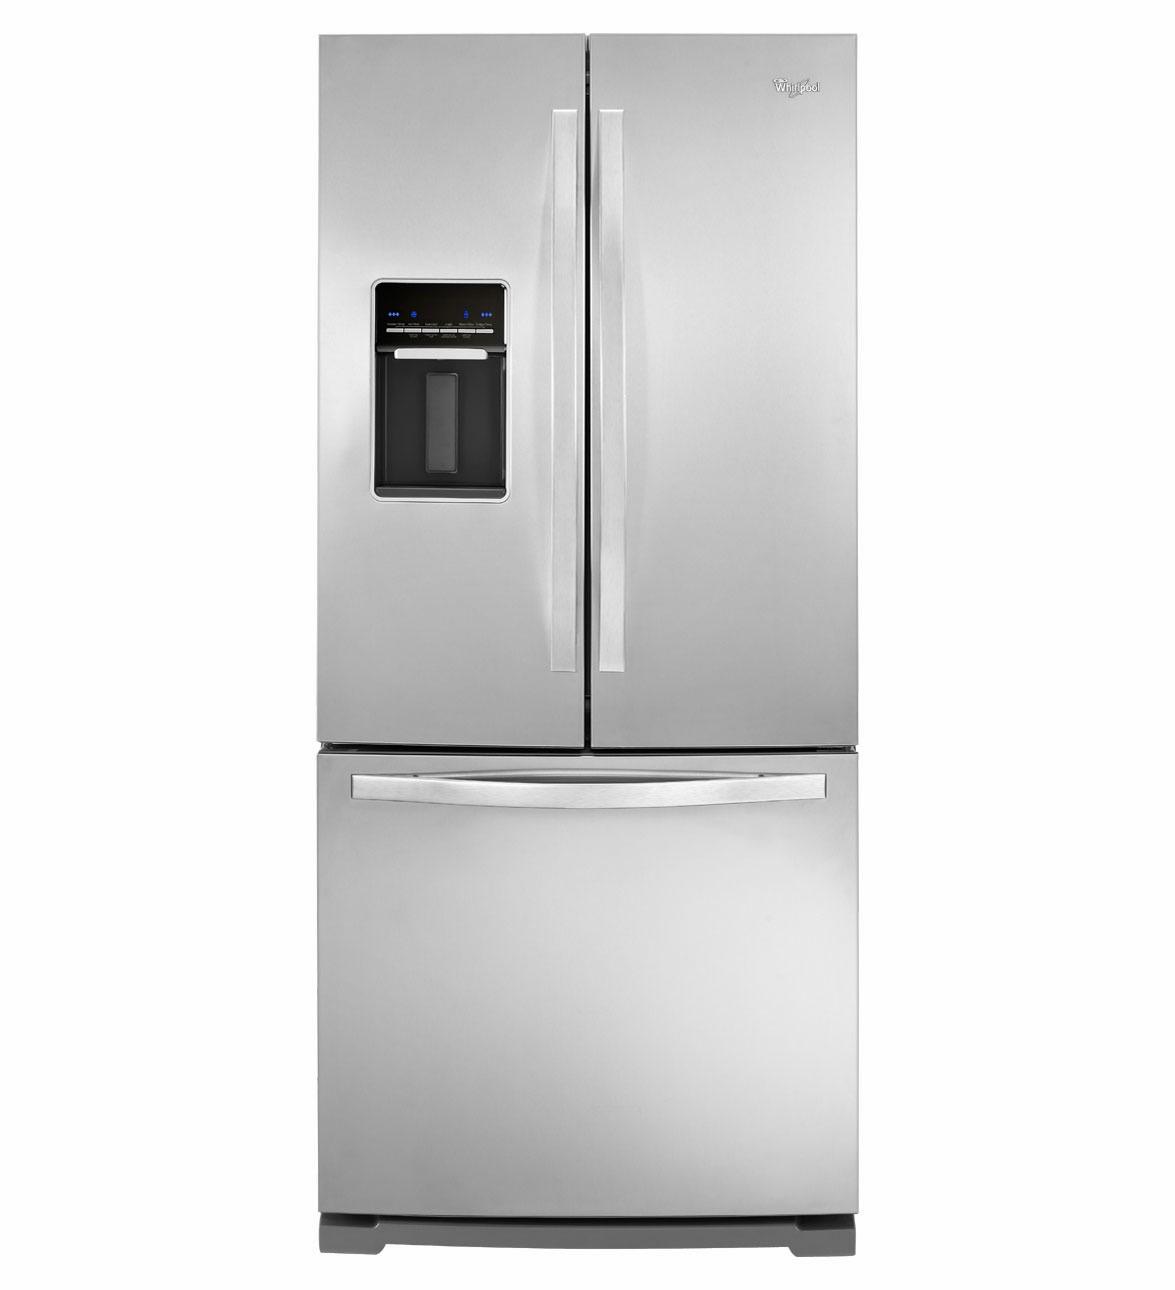 Whirlpool Refrigerator Brand: Whirlpool WRF560SEYM French ...